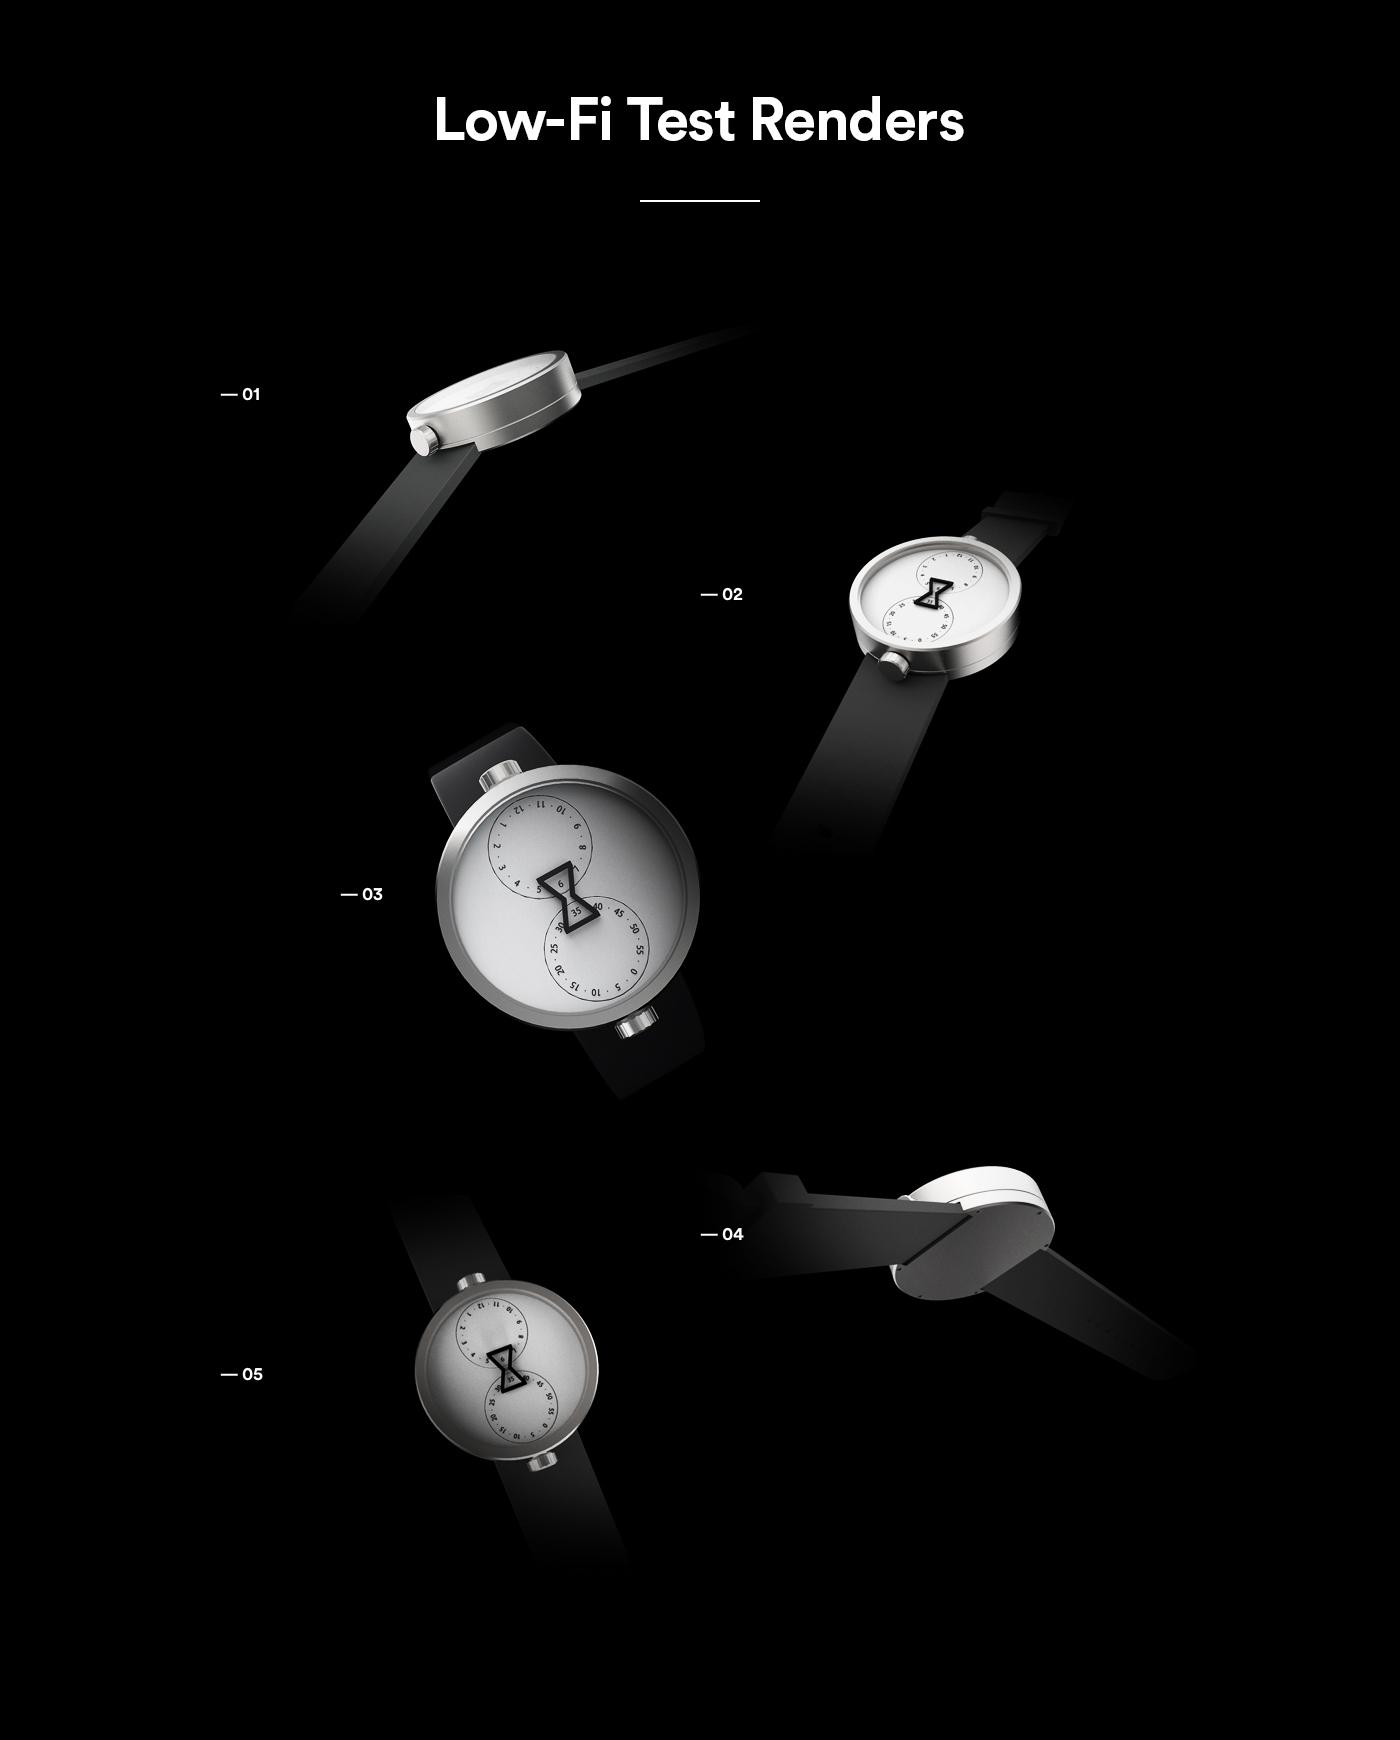 OZO-watch-coming-hisheji (5)